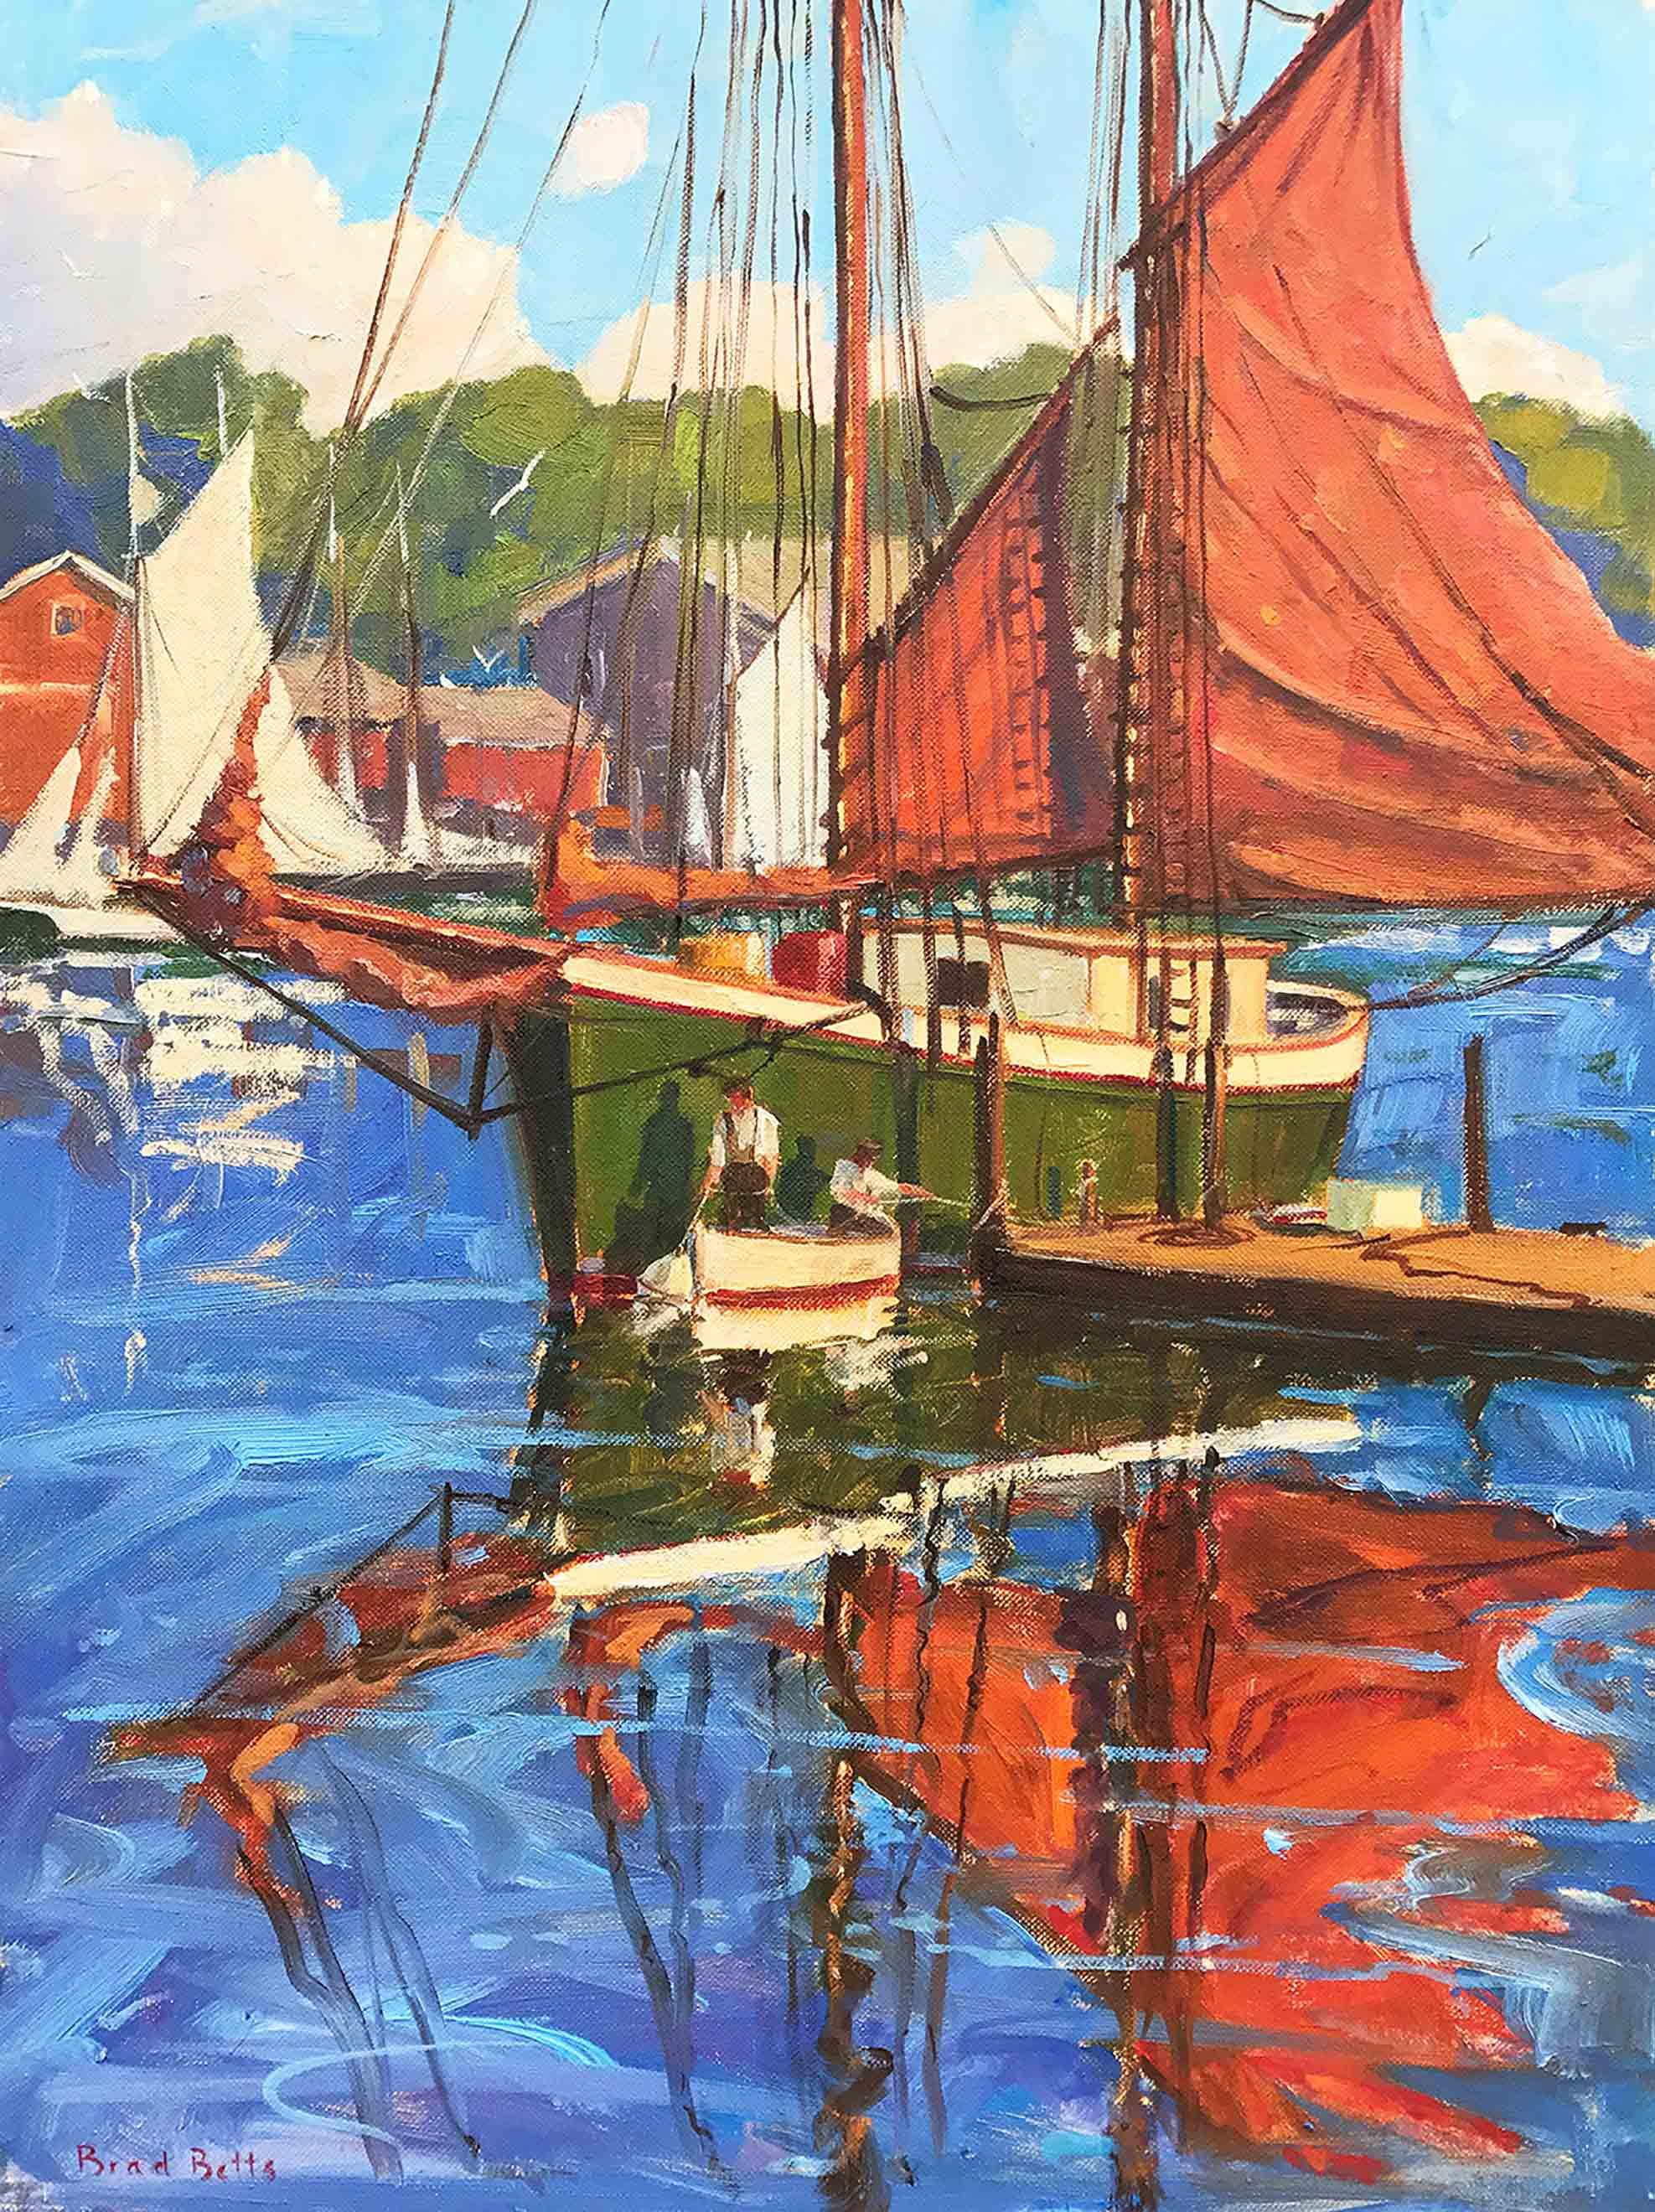 AWARD-WINNER: Drying Sails in Camden Harbor